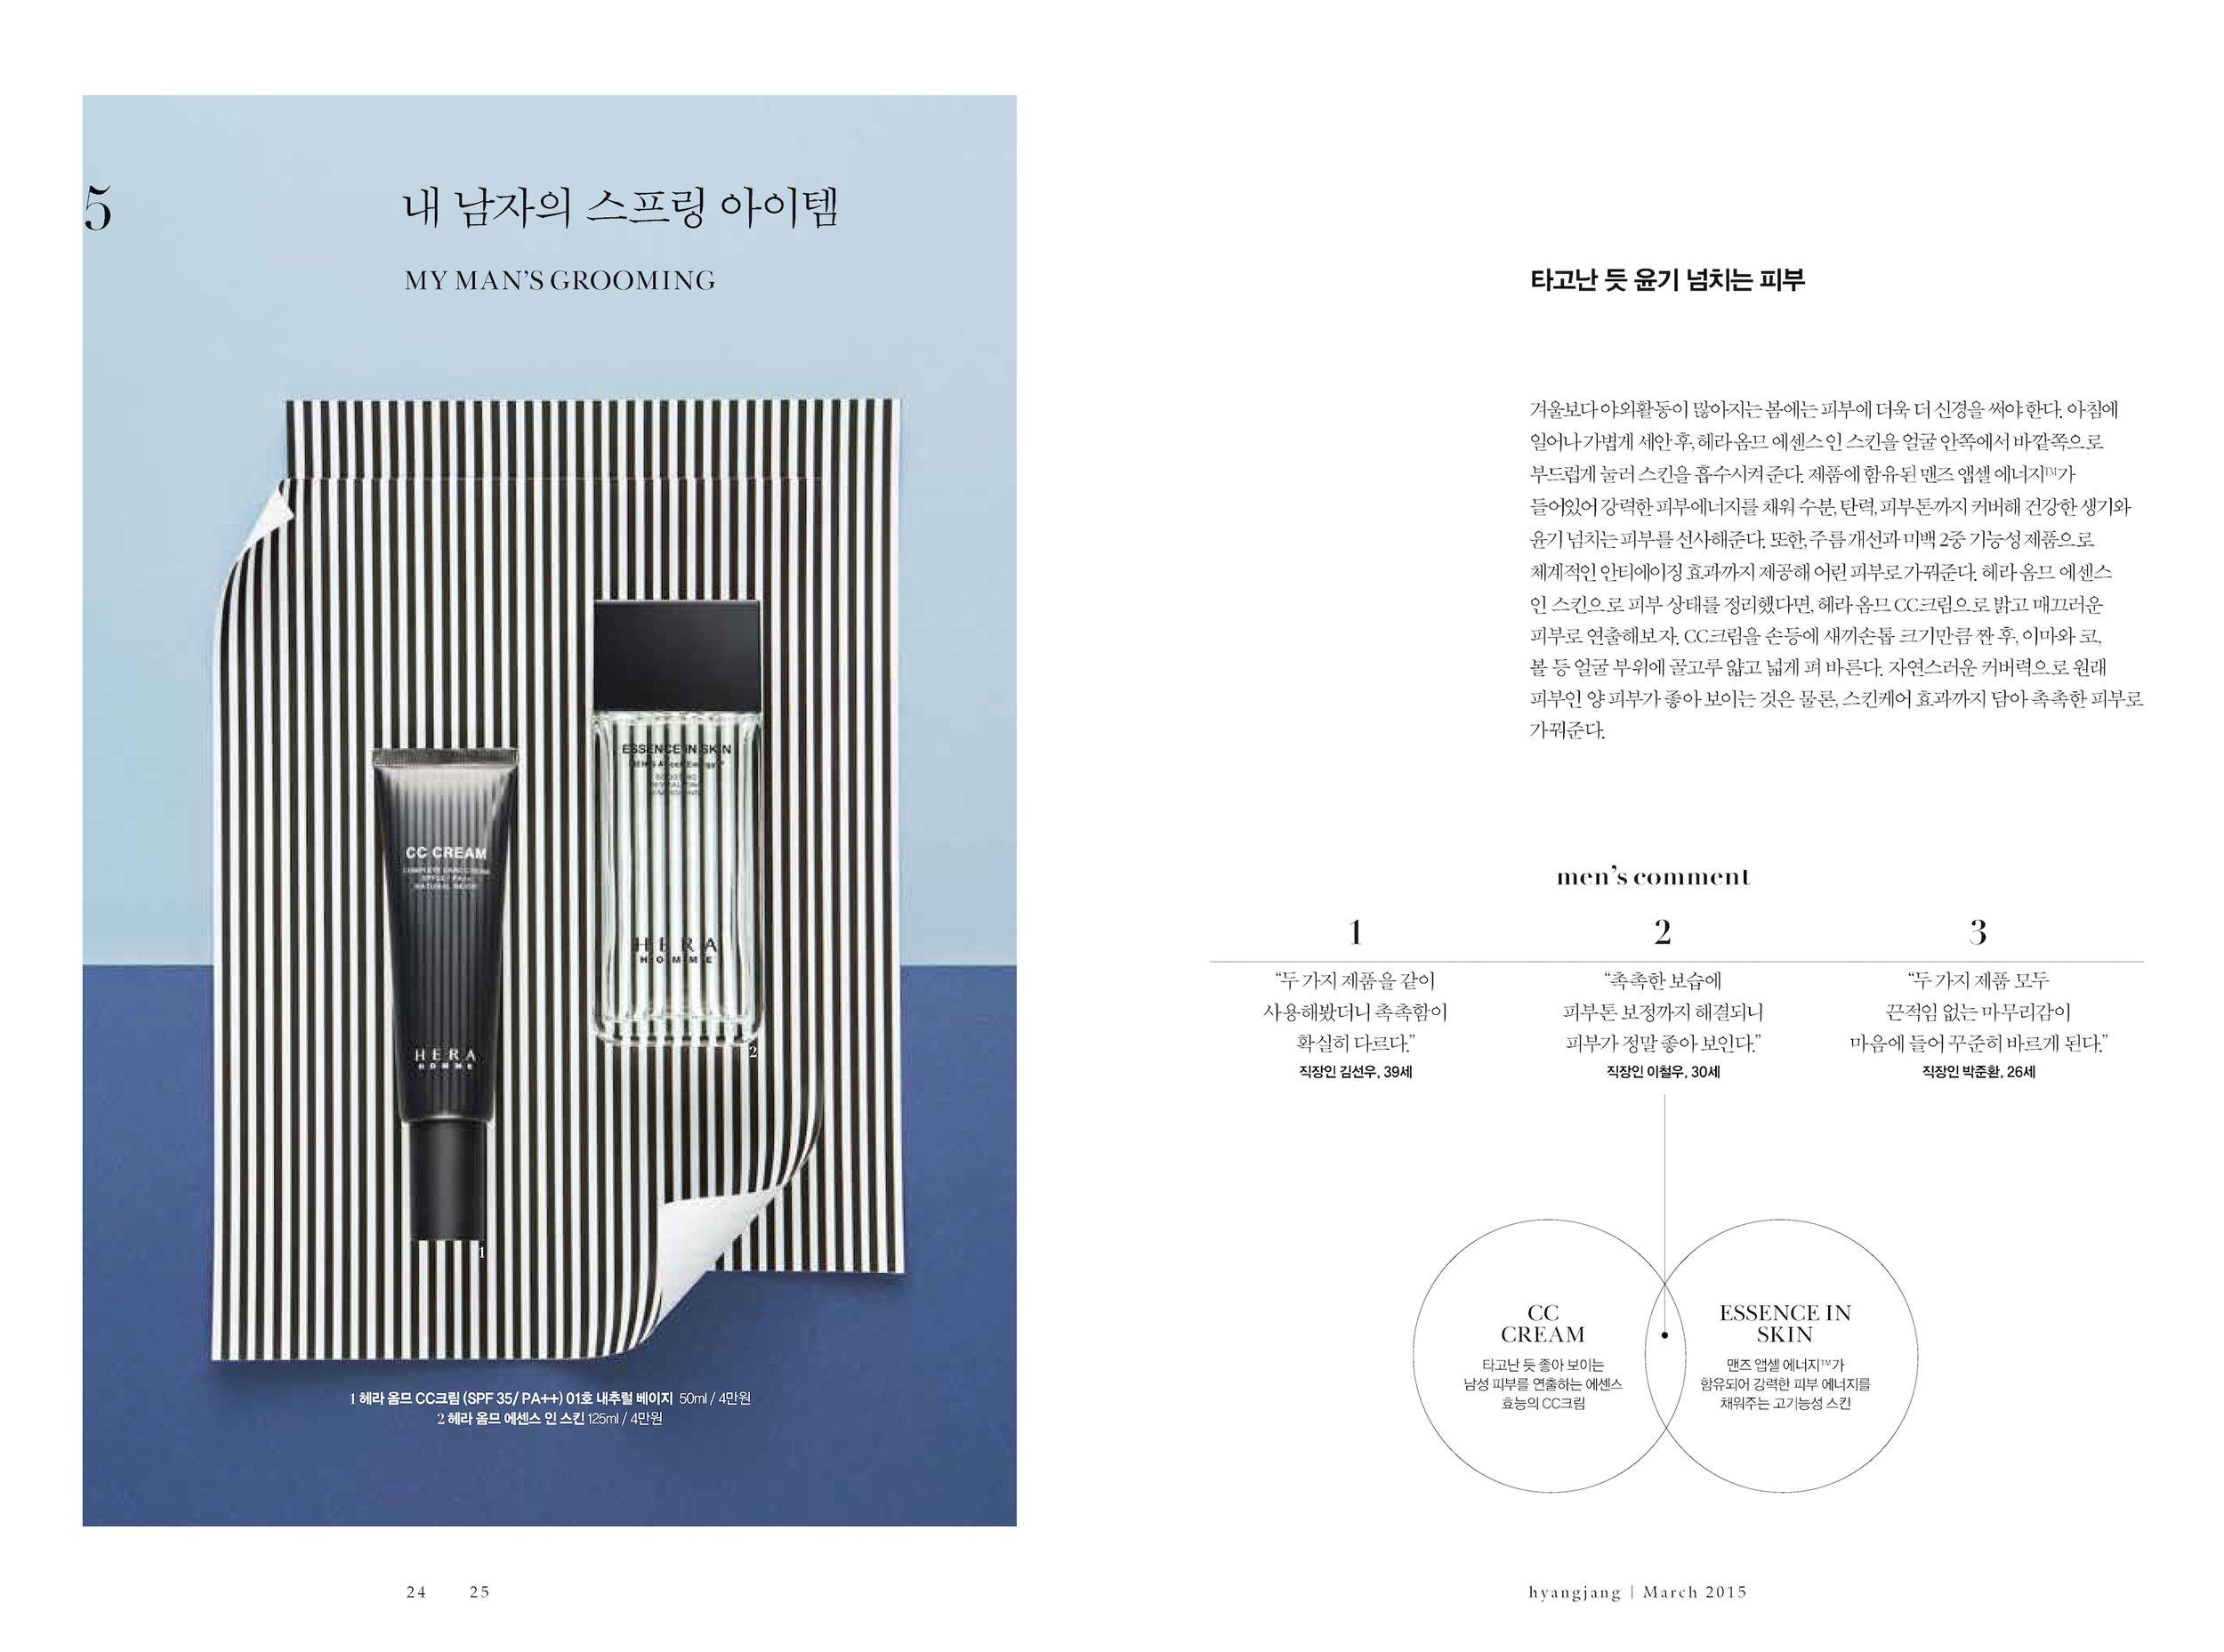 hyangjang-201503_페이지_13.jpeg